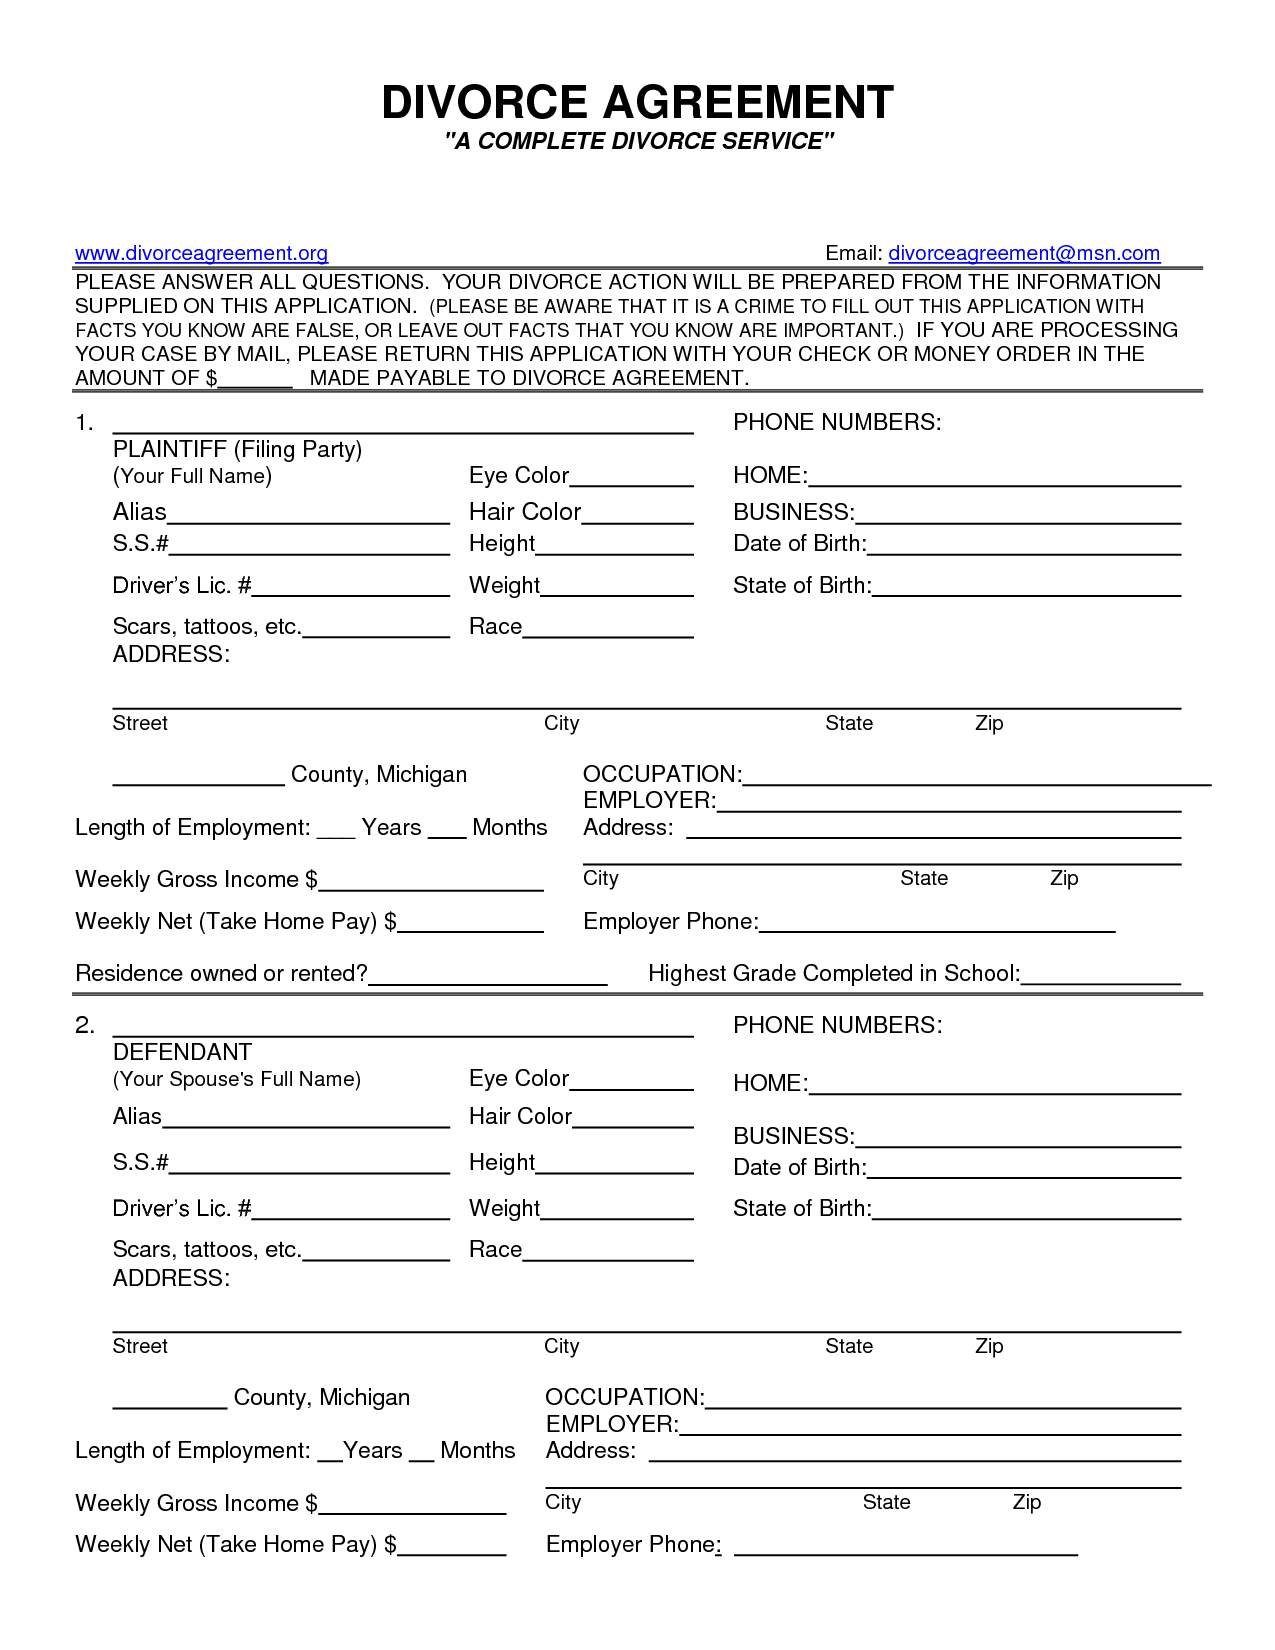 Fake Divorce - Tutlin.psstech.co - Free Printable Divorce Papers For Illinois